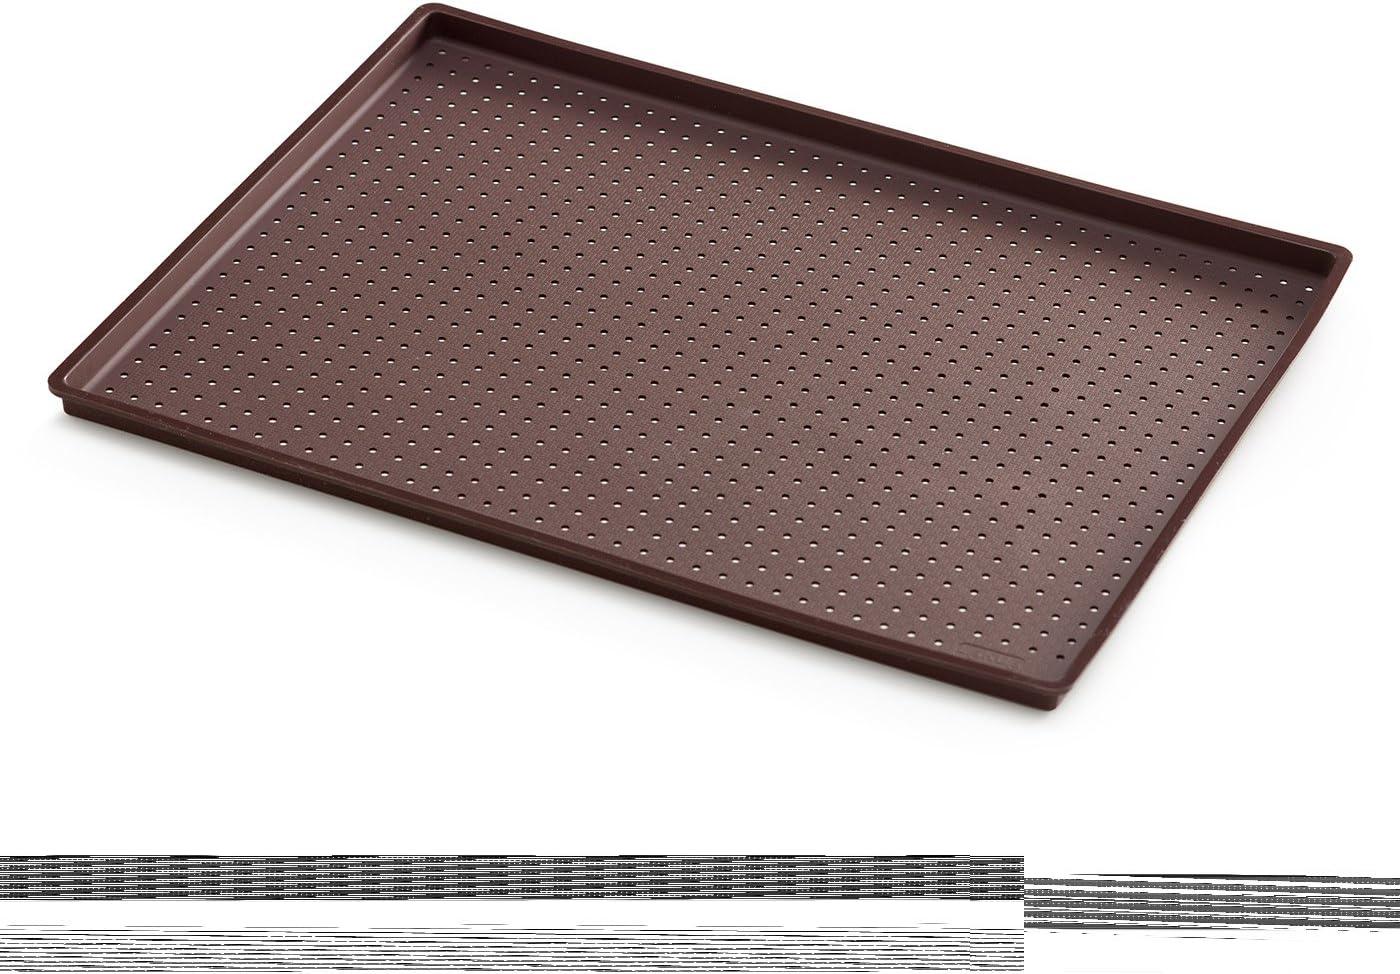 Lekue Micro Perforated Silicone Baking Pizza 0.59